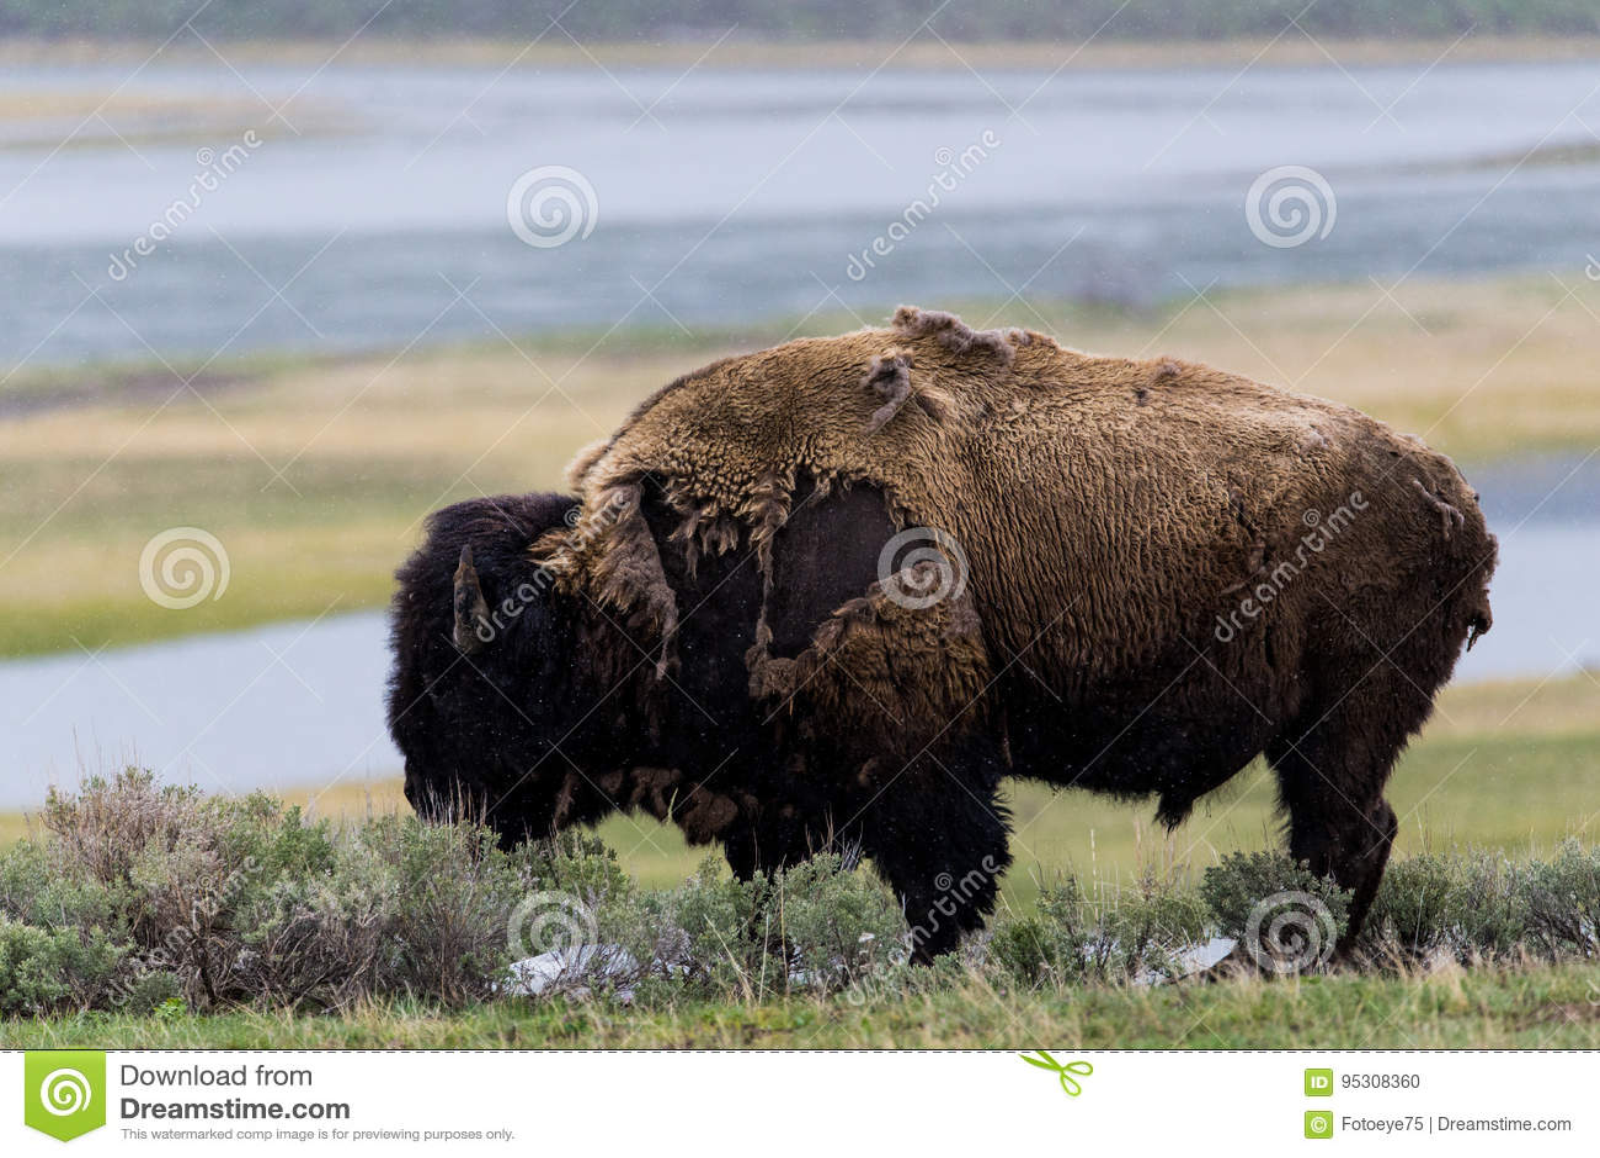 wild bison buffalo grazing - Yellowstone National Park - mountain wildlife